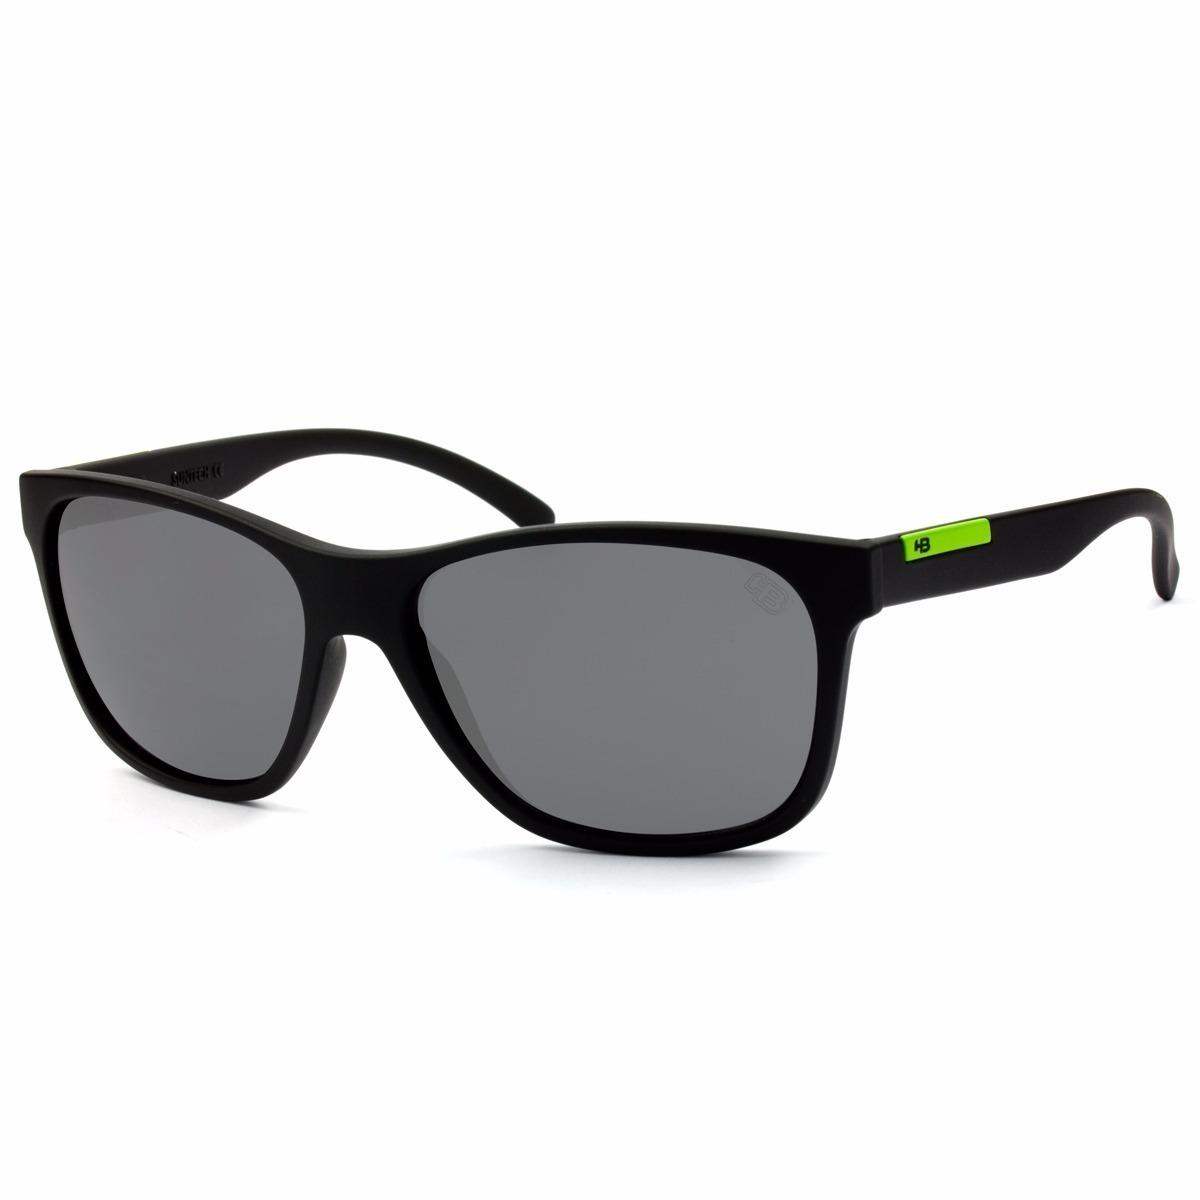 oculos sol masculino hb underground original preto verde. Carregando zoom. 30d5b14327